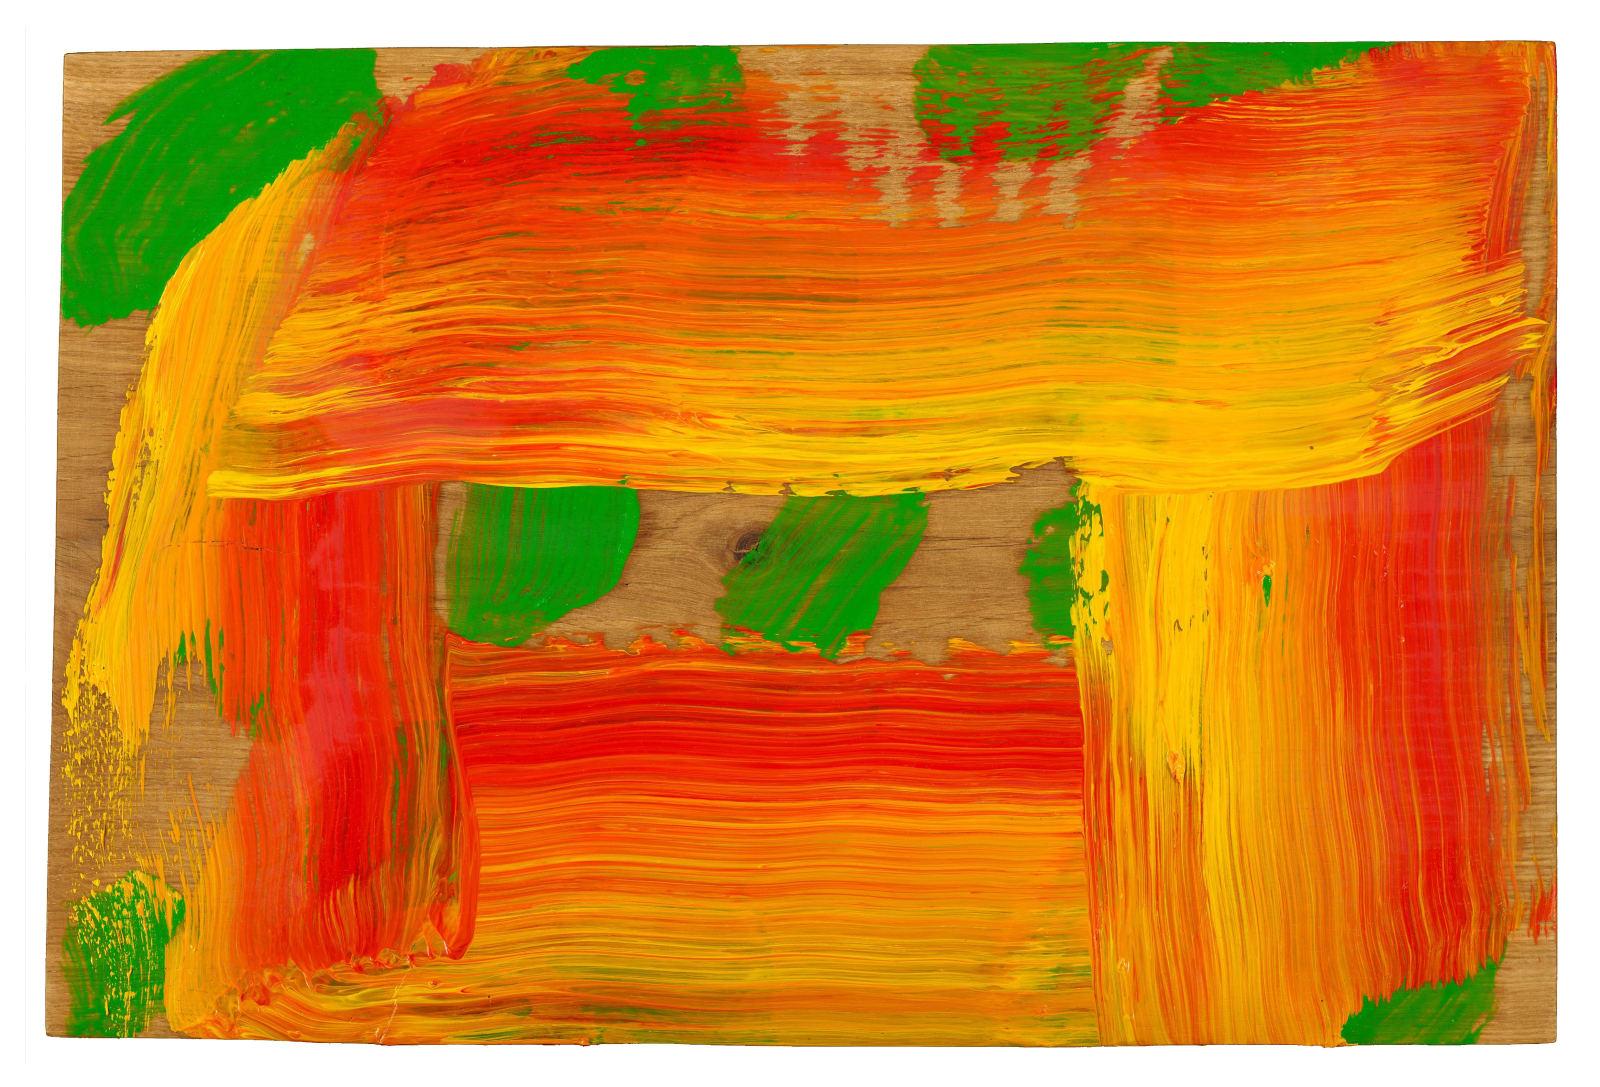 Howard Hodgkin 1932-2017 Through a Glass Darkly, 2015-16 oil on wood 10 7/8 x 16 1/4 inches / 27.5 x 41.3 cm